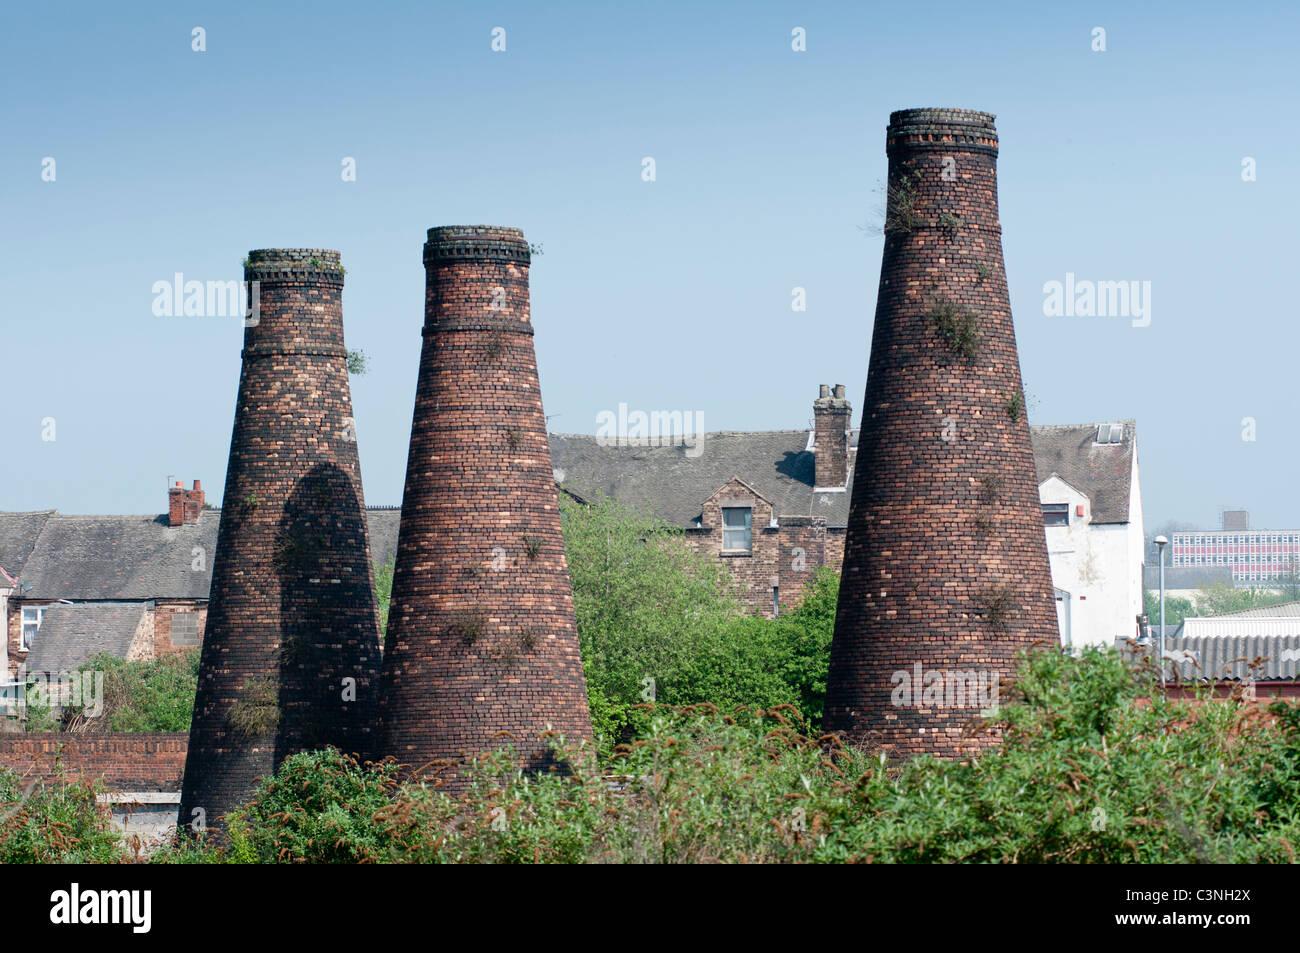 Acme Marls Pottery Bottle Kilns at Burslem Stoke on Trent, England. - Stock Image